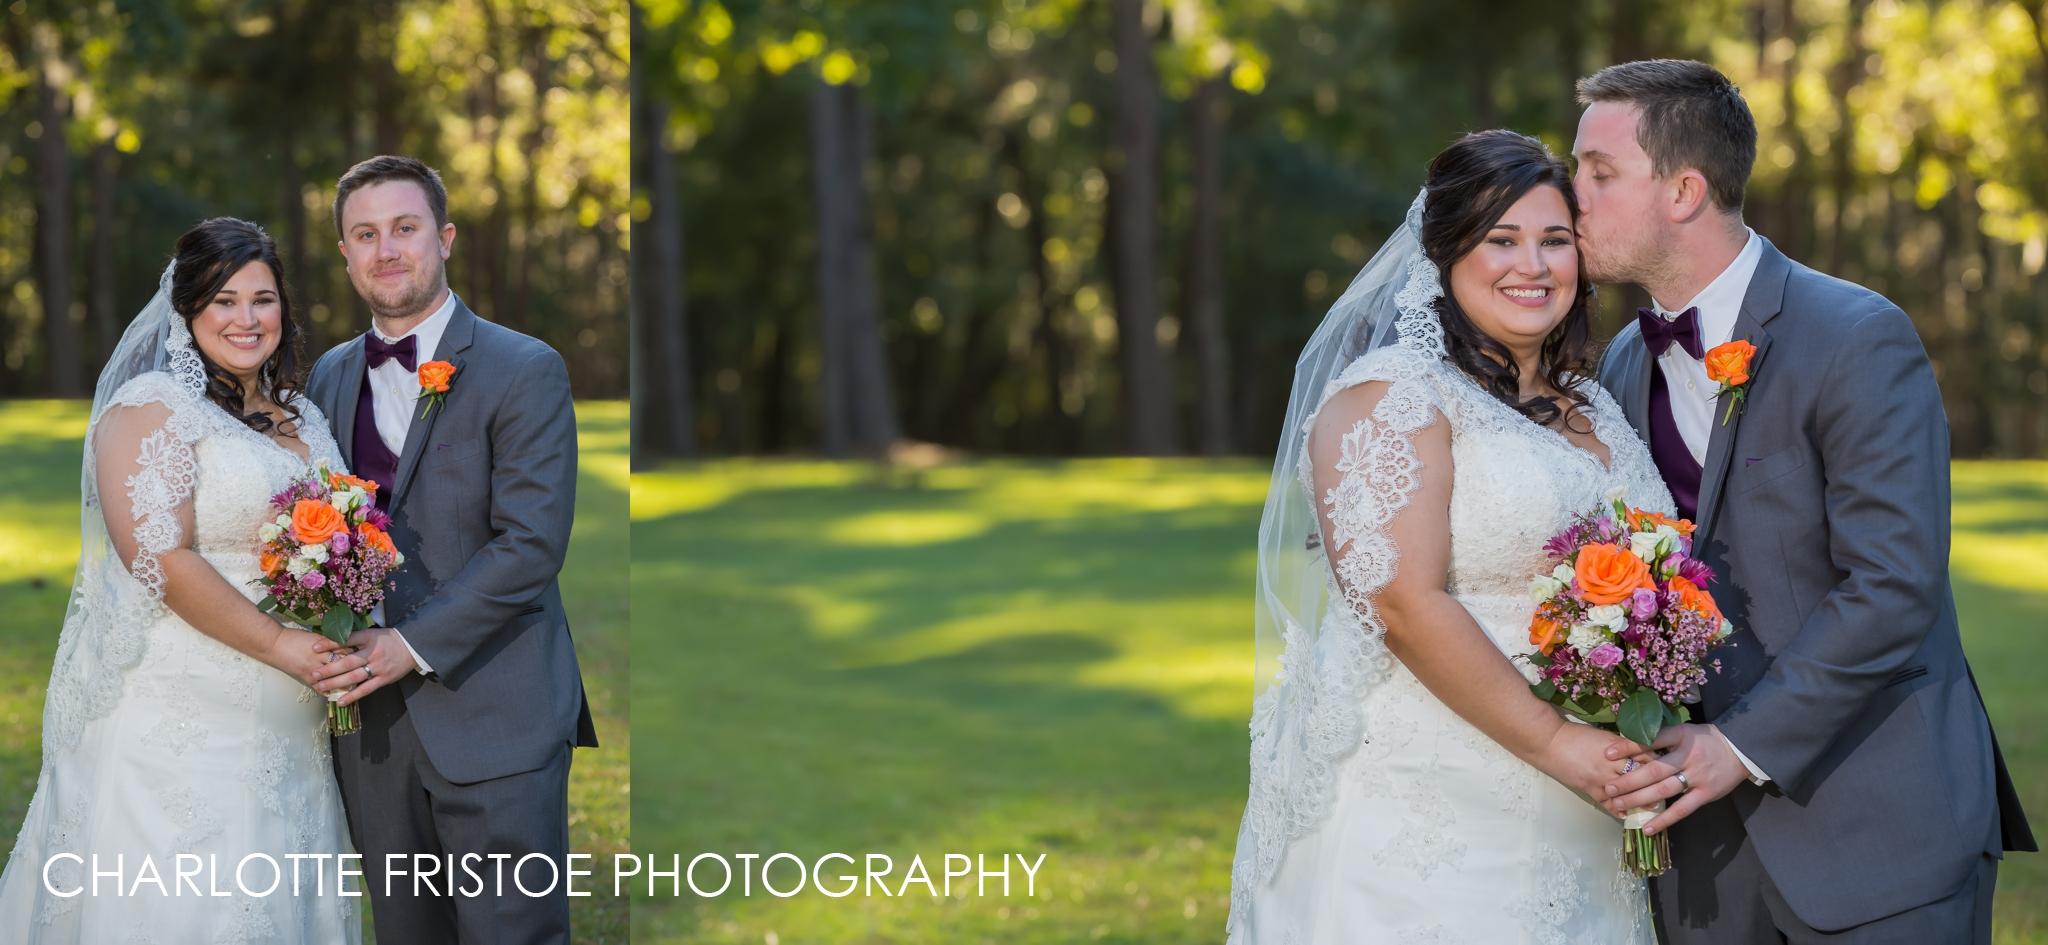 Lake Iamonia Wedding Charlotte Fristoe Photography-56.jpg